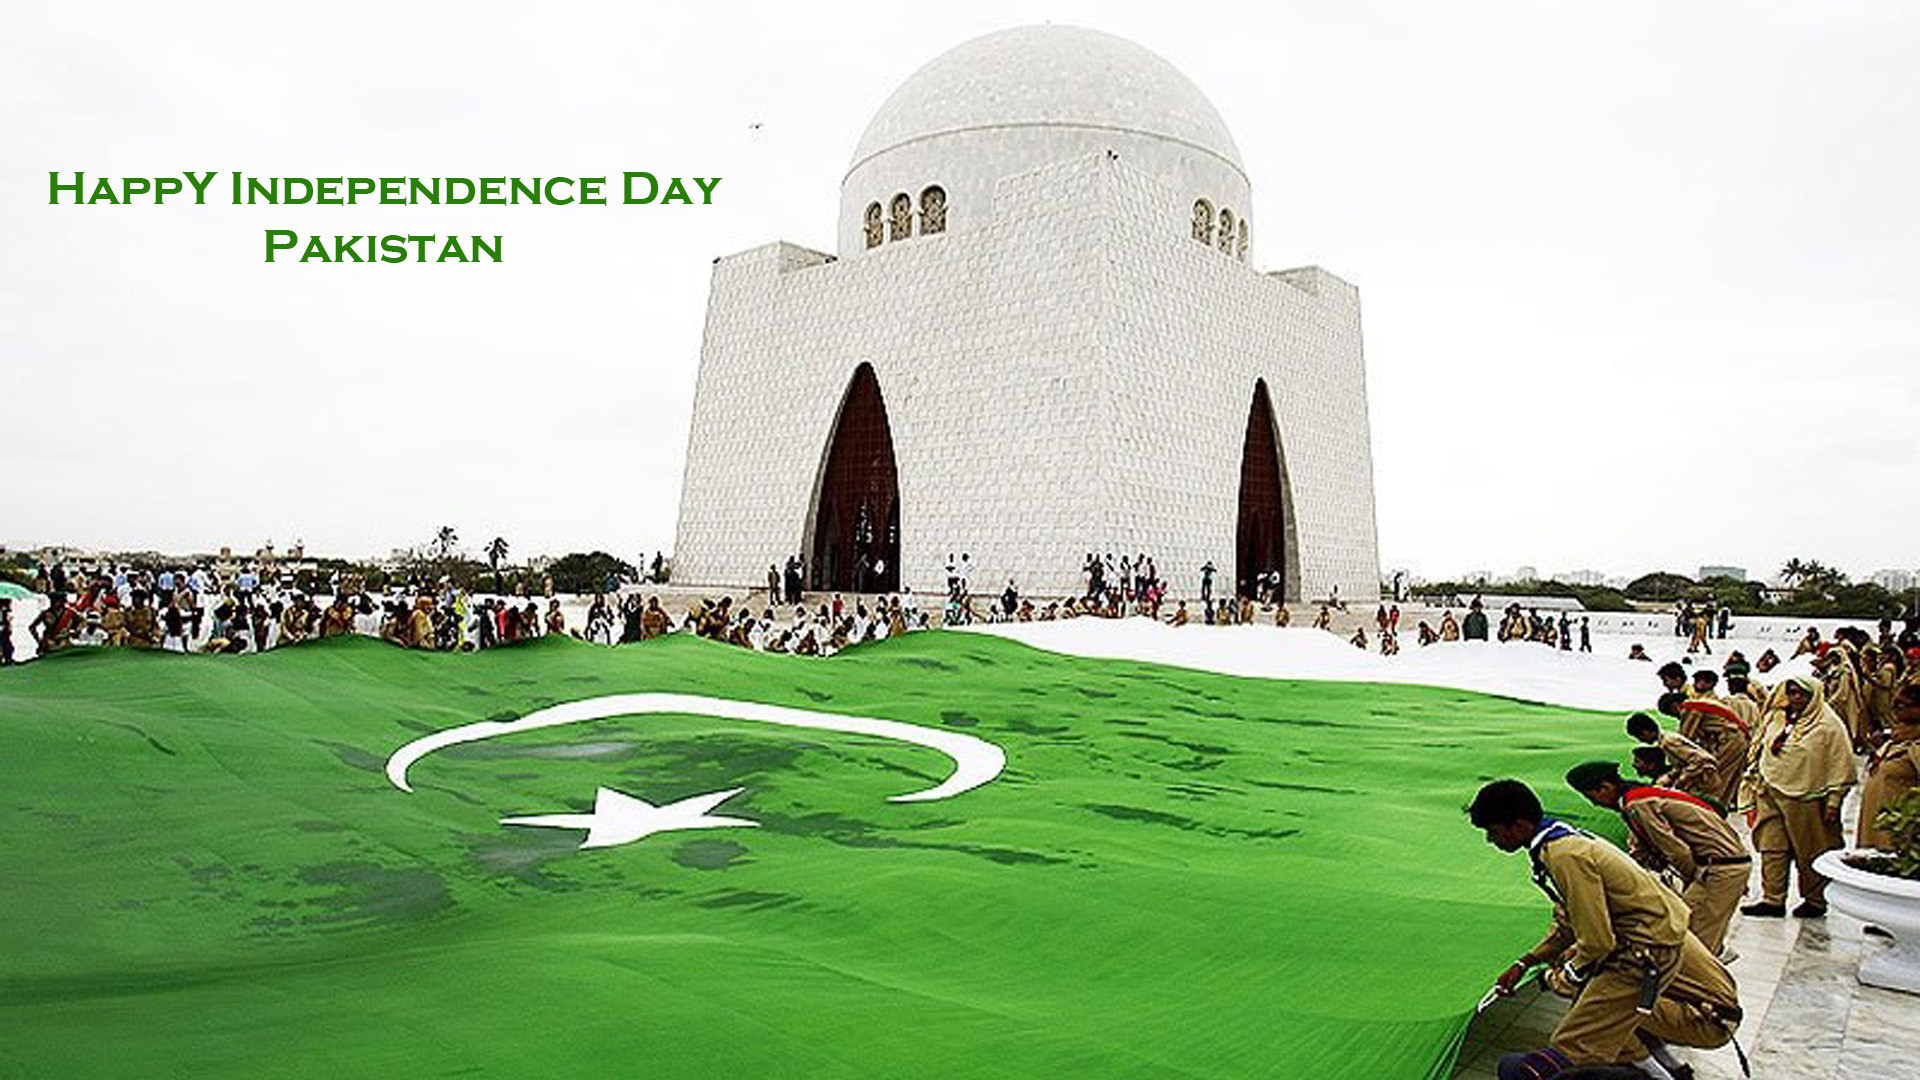 Res: 1920x1080, Pakistani Celebrating Independence On Quaid-e-Azam Mazar Wallpaper